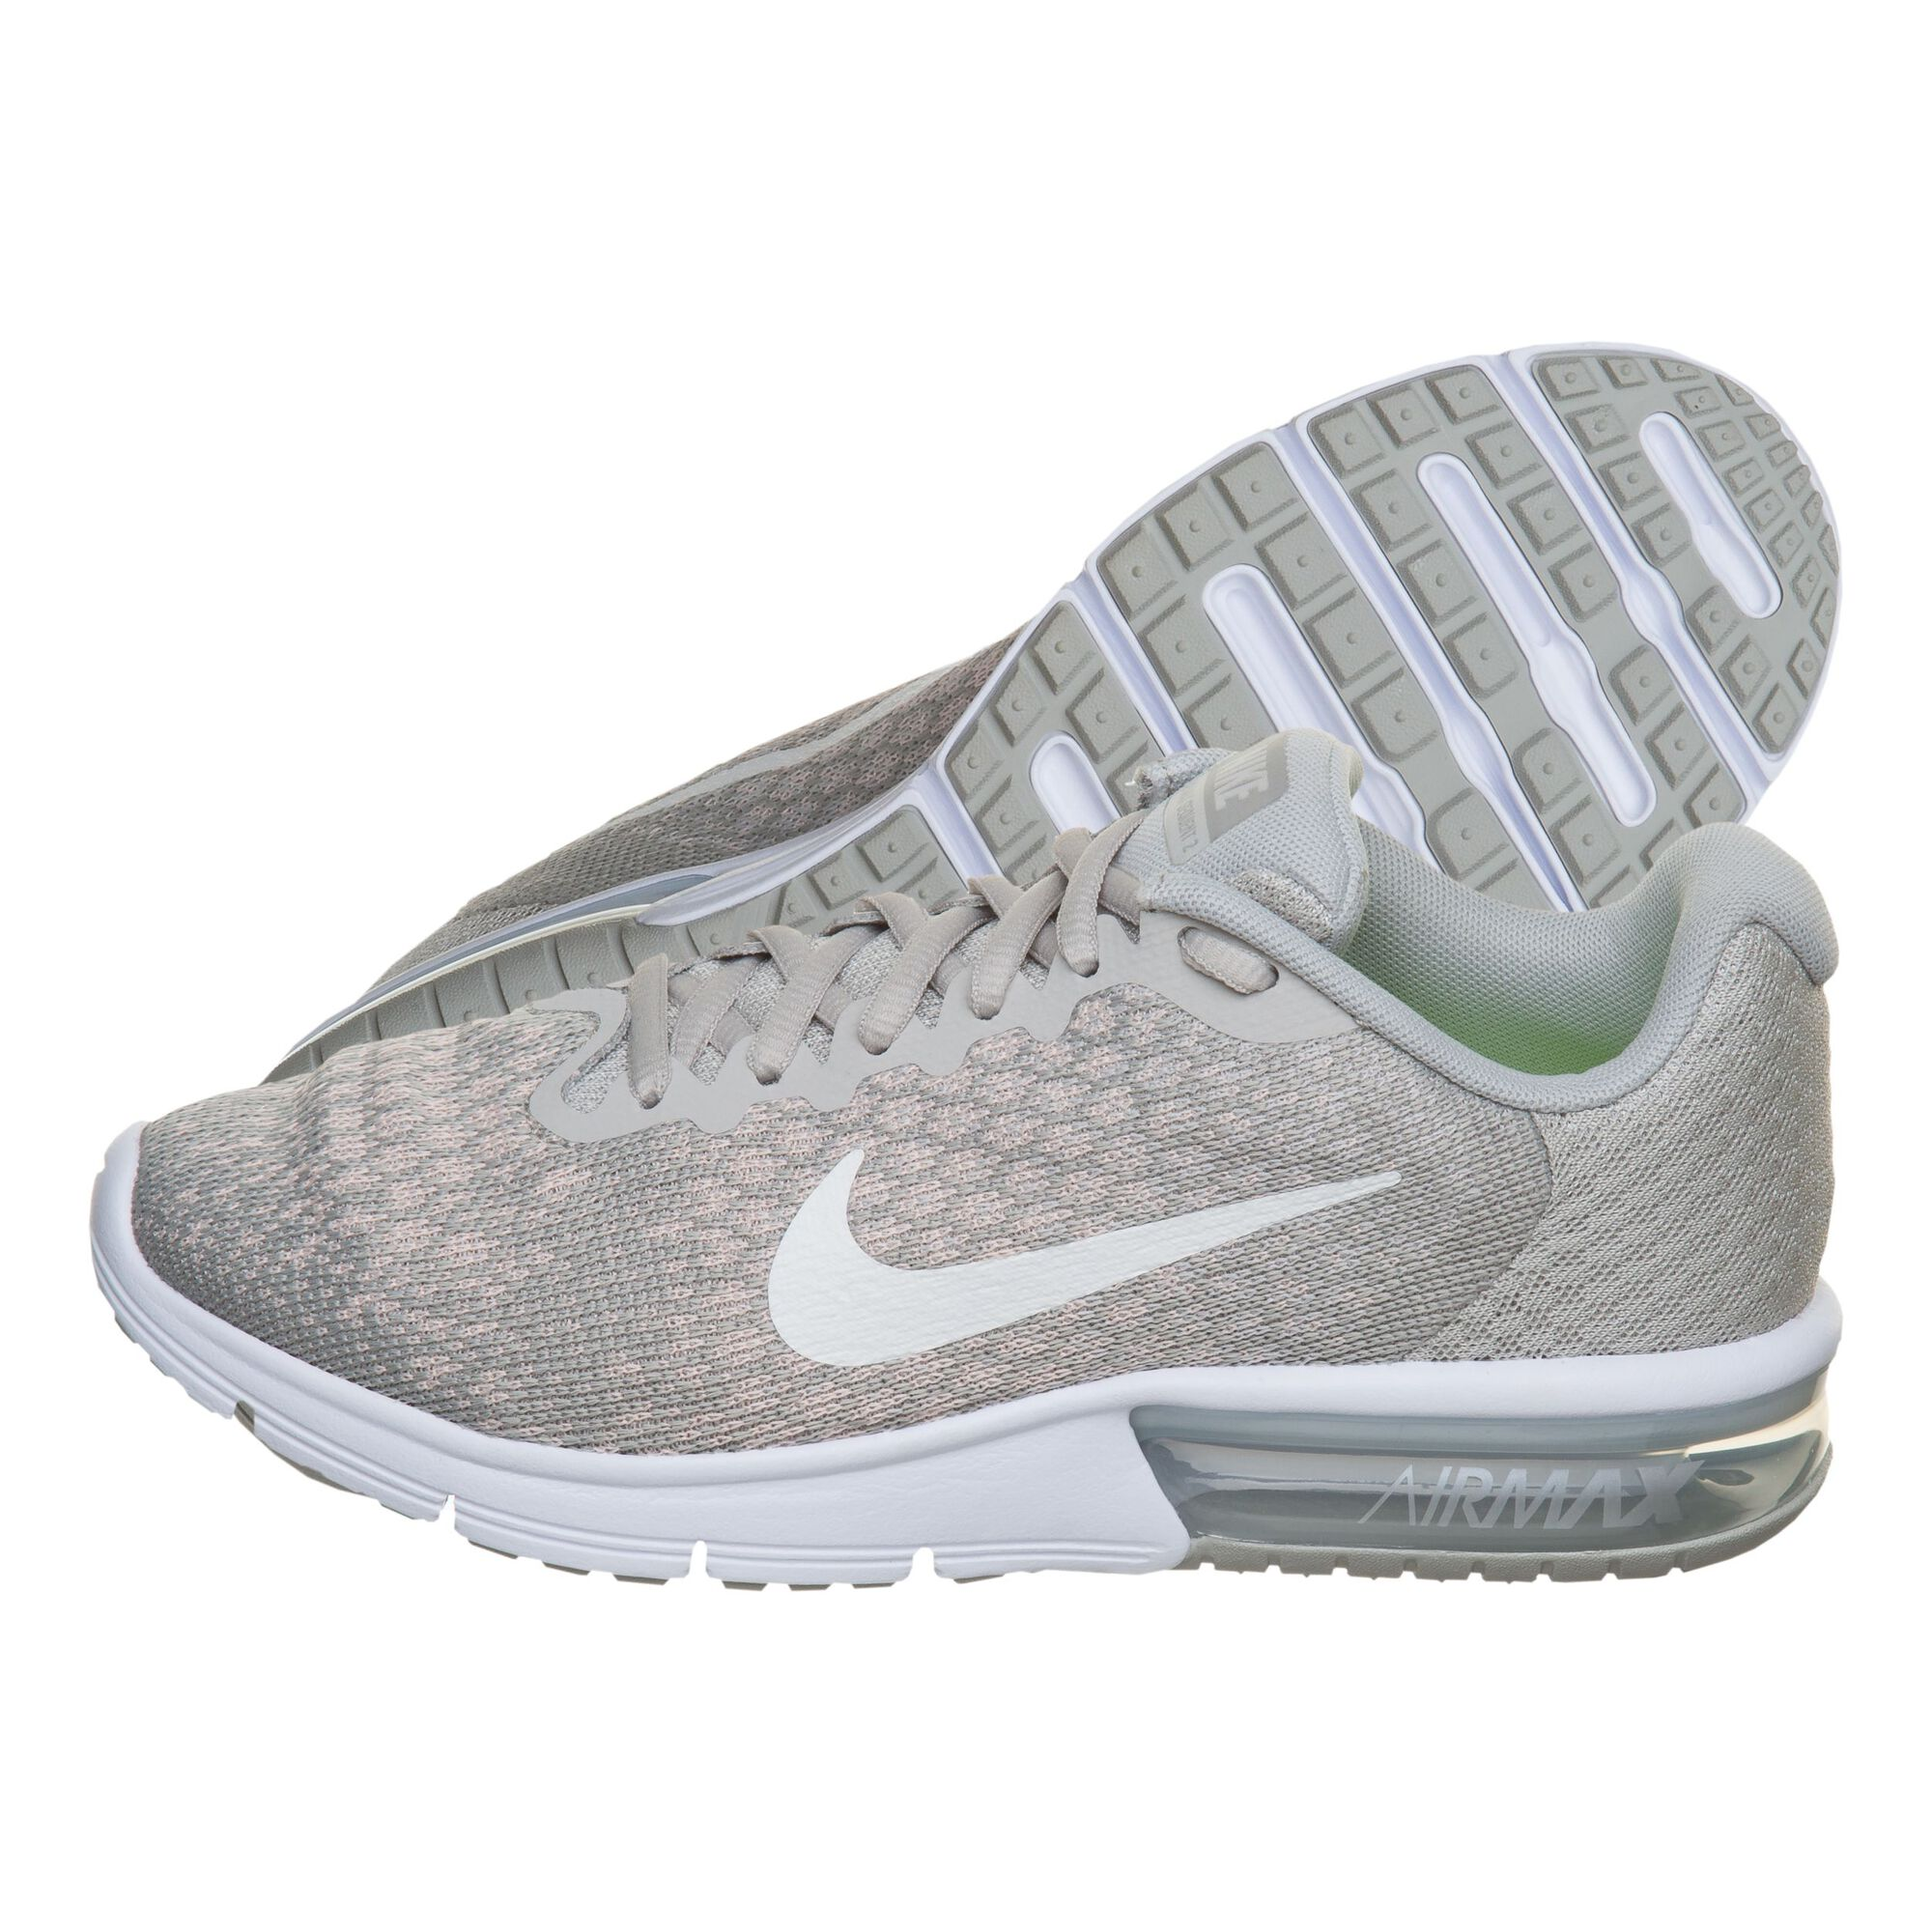 save off d57e7 cb377 ... Nike  Nike  Nike  Nike  Nike  Nike. Air Max Sequent 2 Women ...